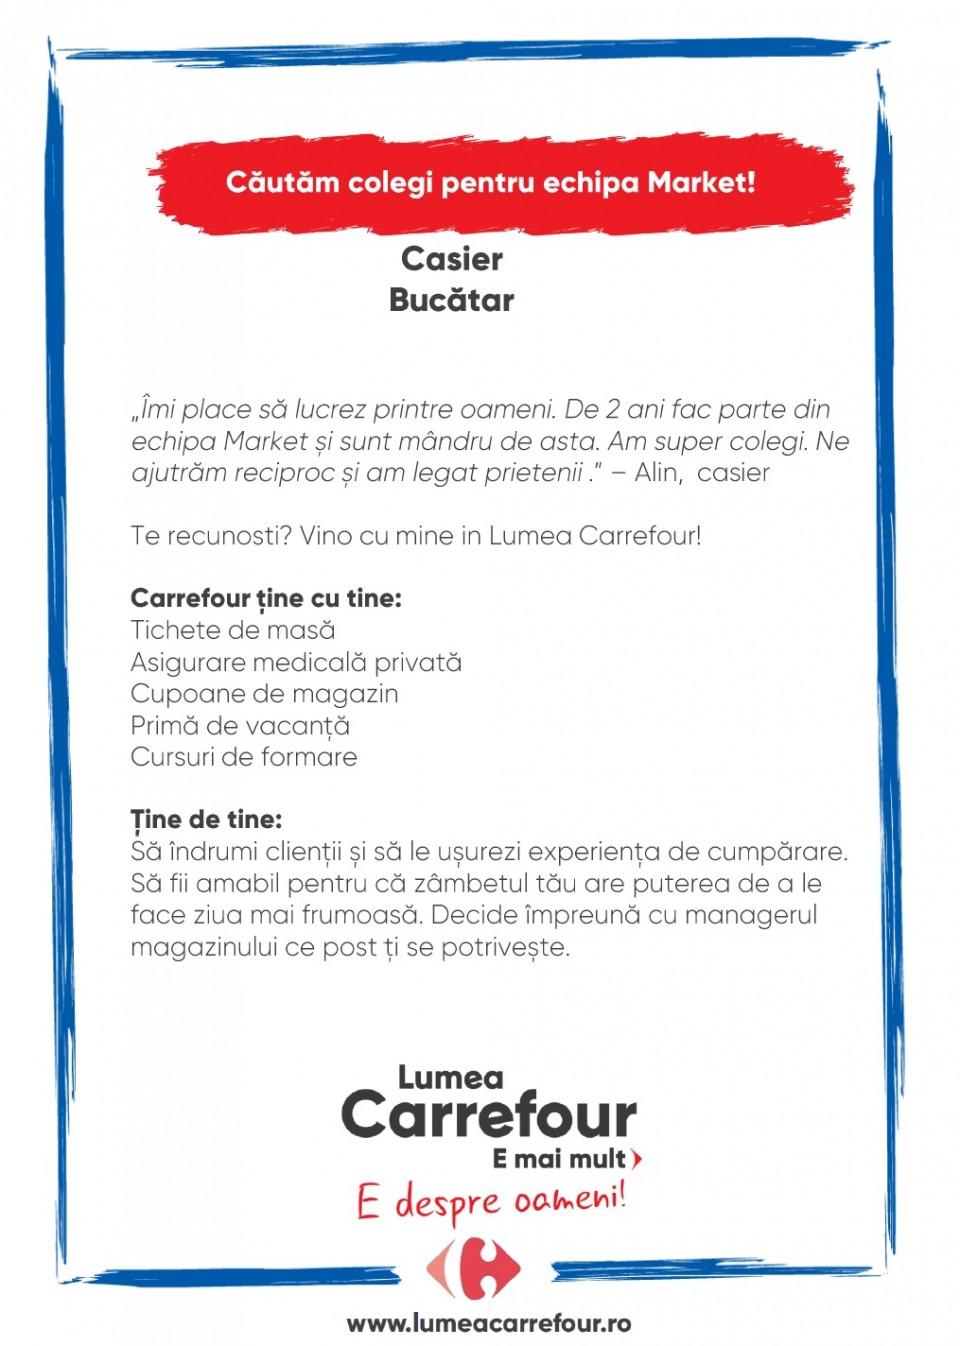 Intra in lumea Carrefour Market Bucatar si Casier Brasov!